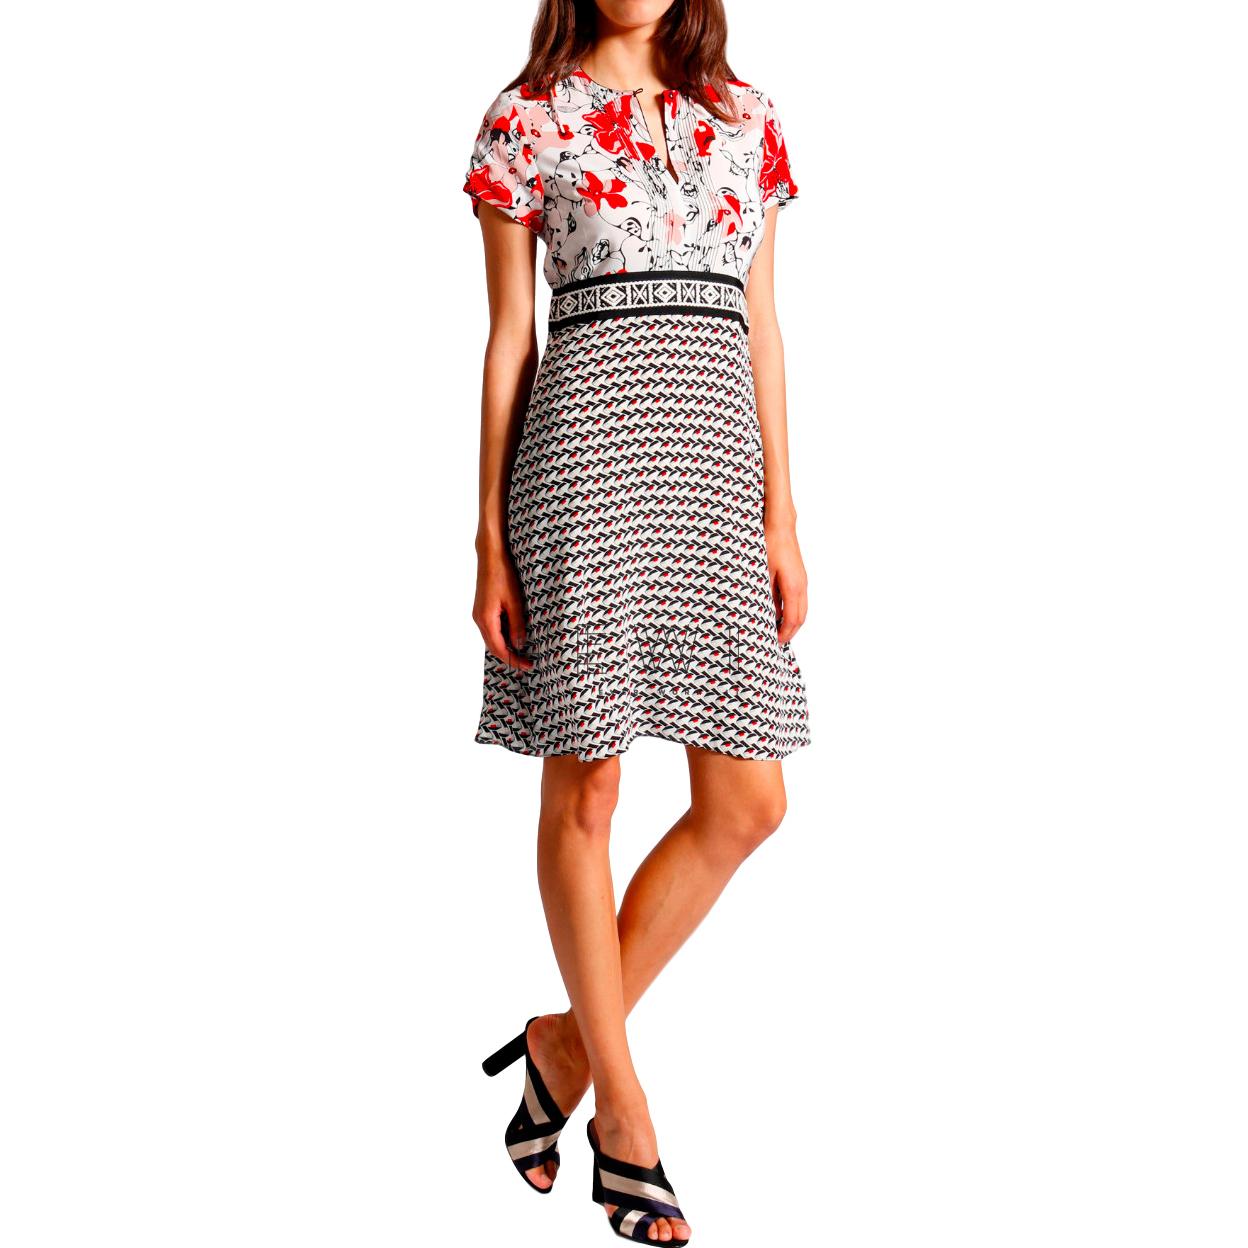 Dorothee Schumacher Multi-Print A-line Dress